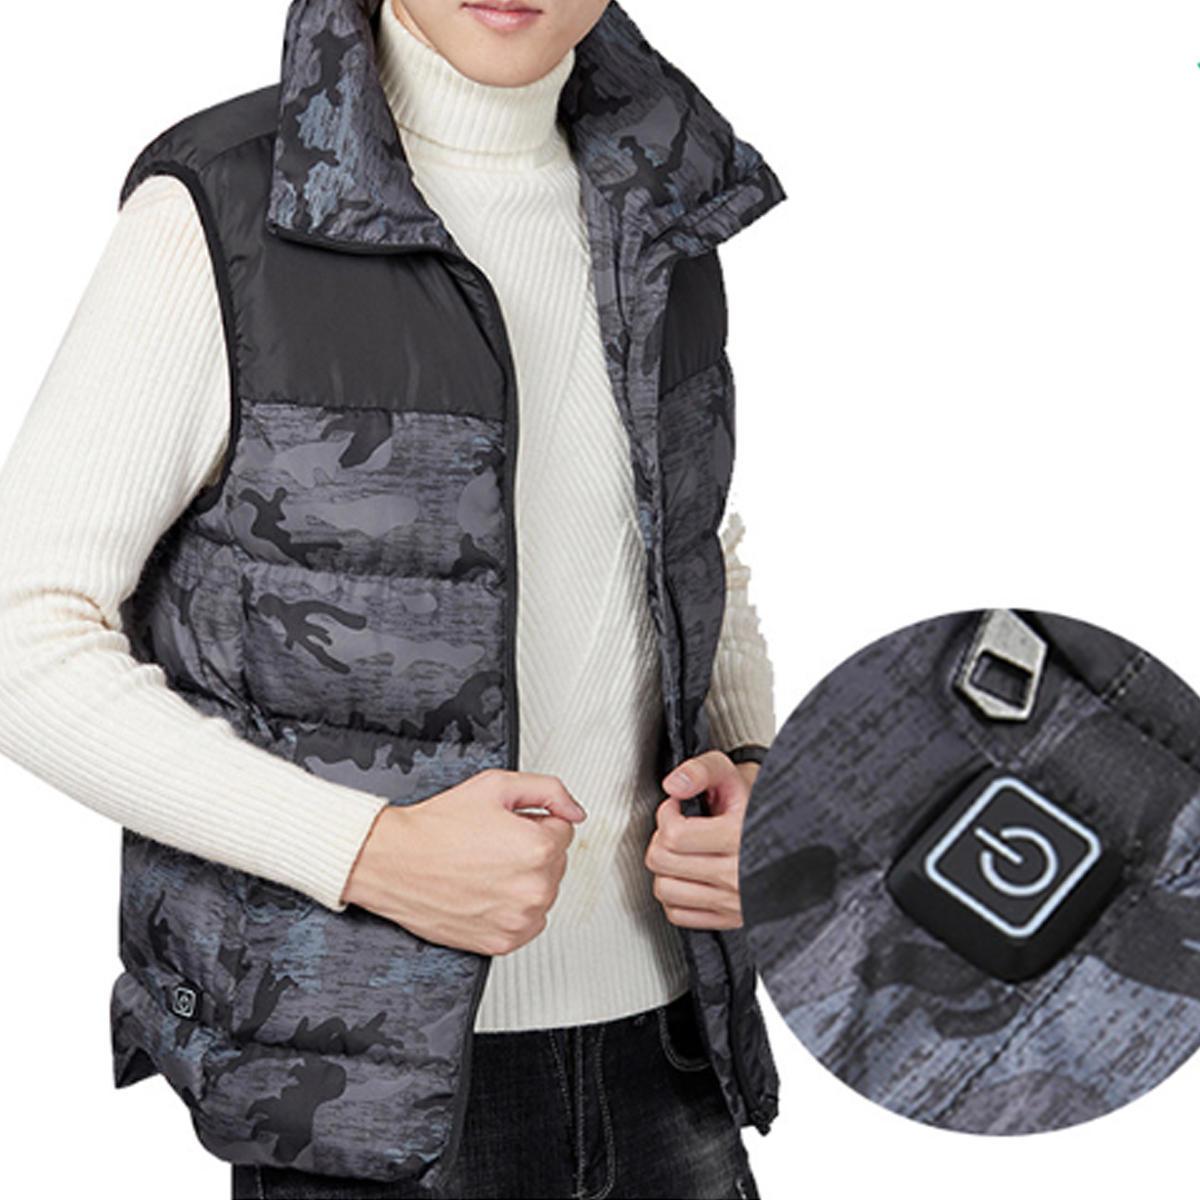 Electric Vest Heated Cloth Jacket USB Warm Heating Pad Body Winter Warmer Gray